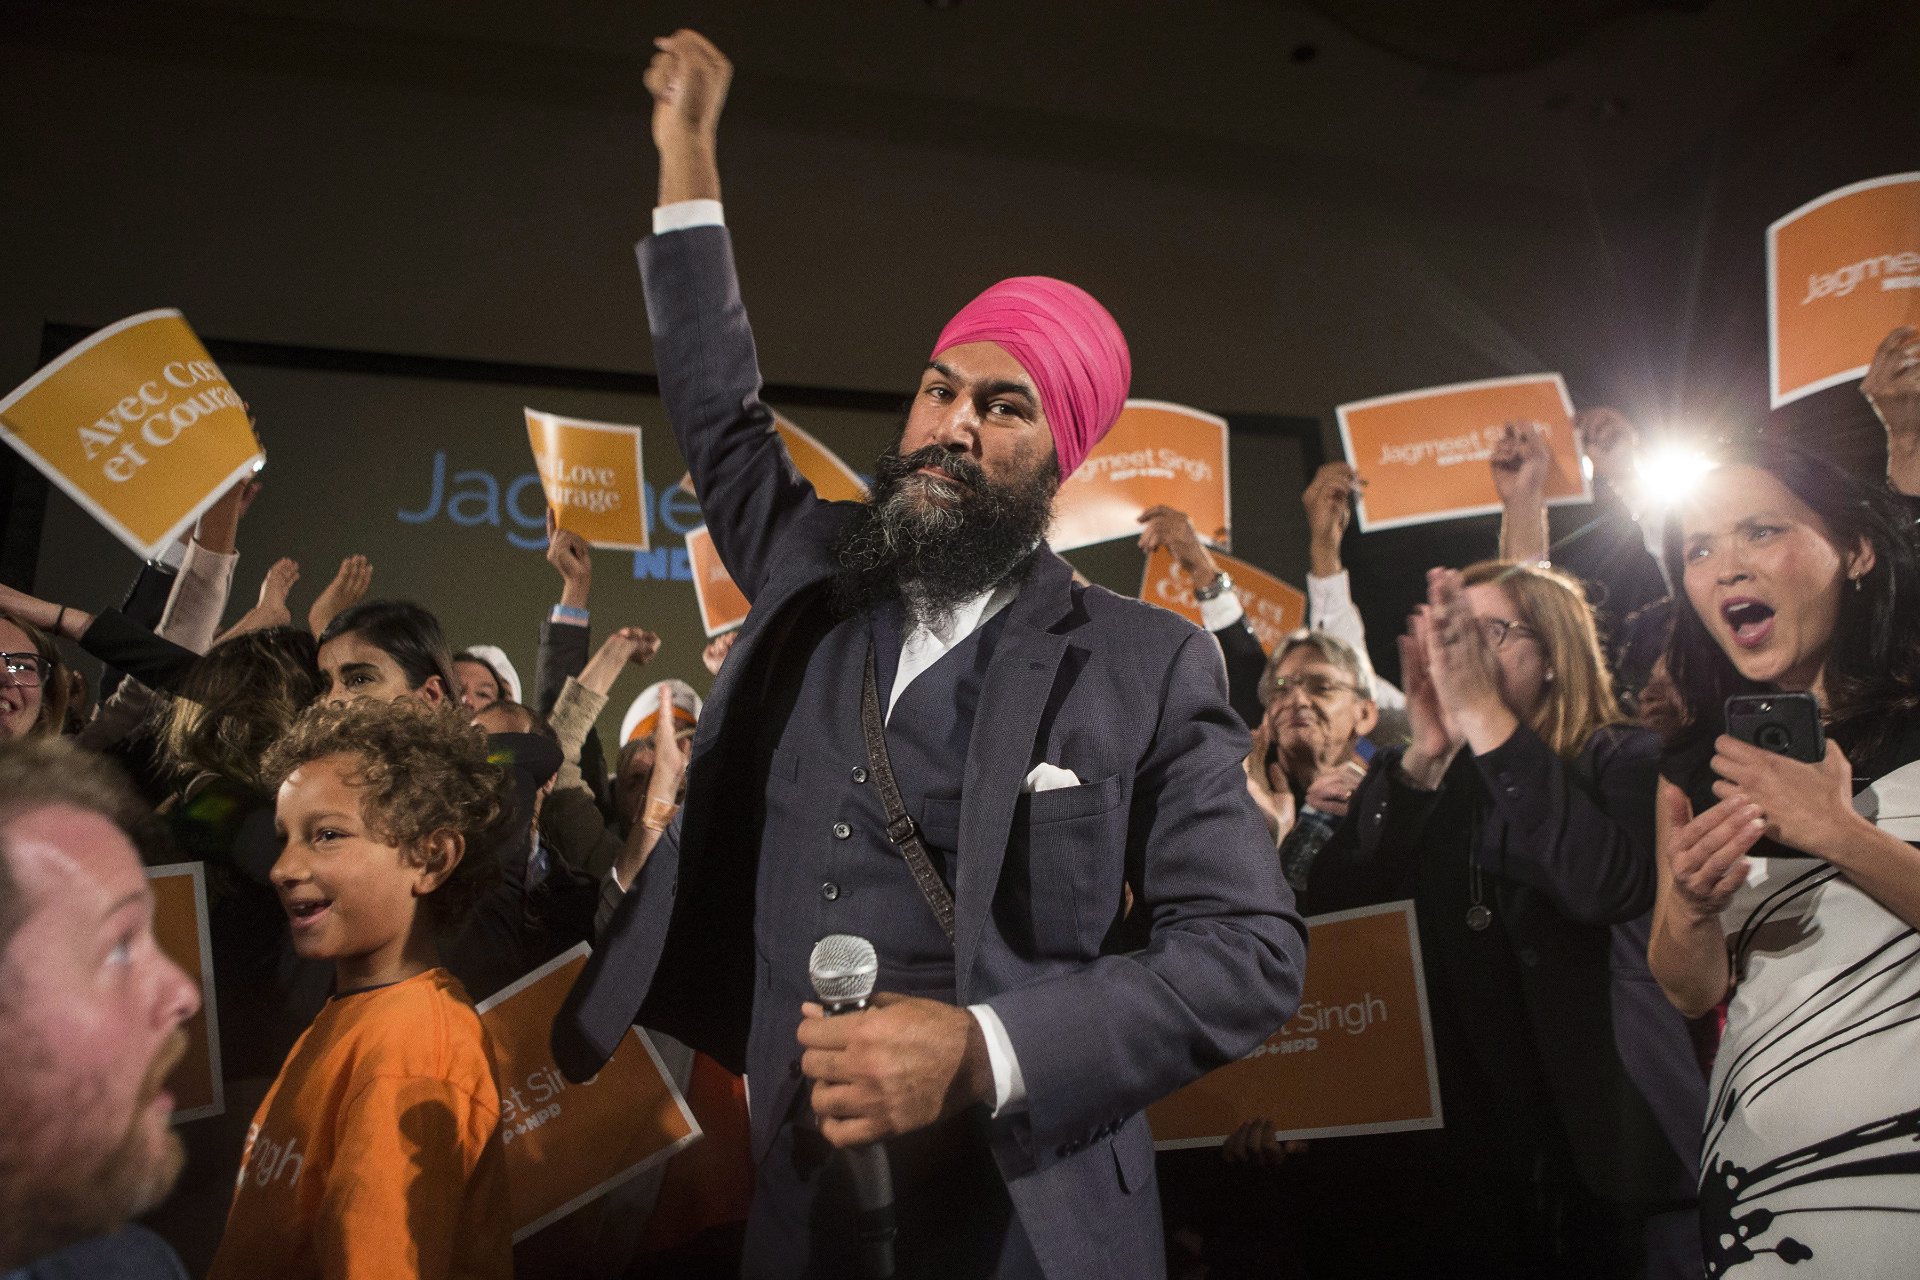 WSO (Canada) Congratulate Jagmeet Singh on Historic NDP Leadership Victory